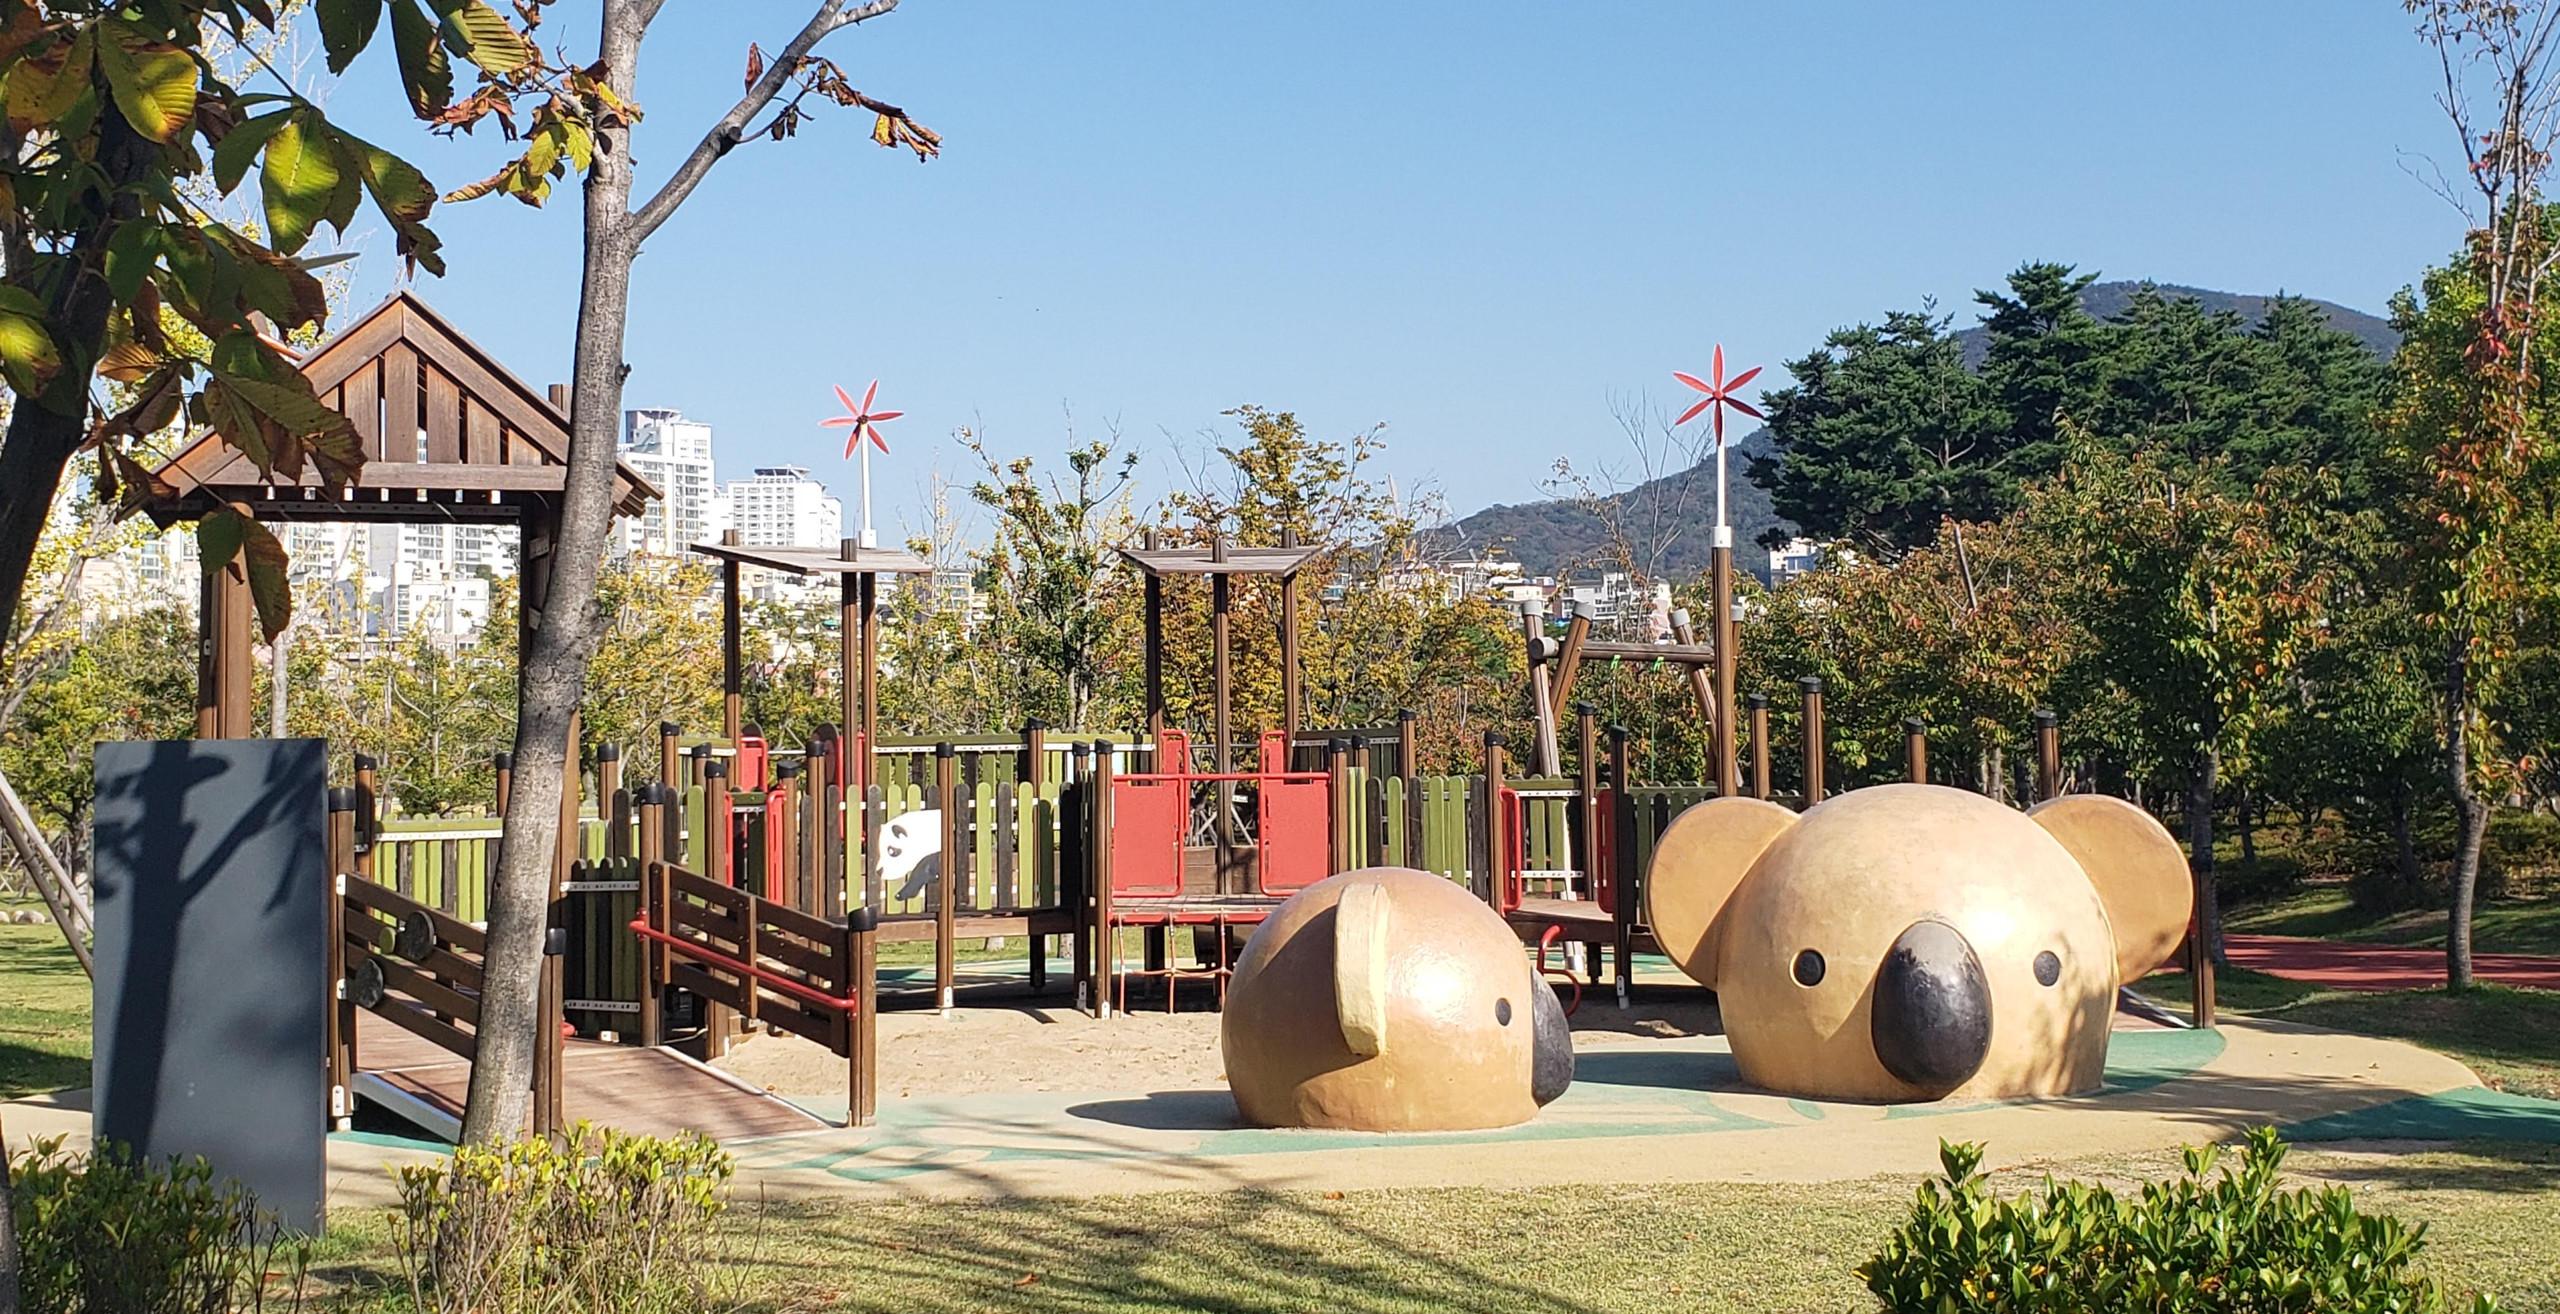 Playground at Busan Citizen's Park